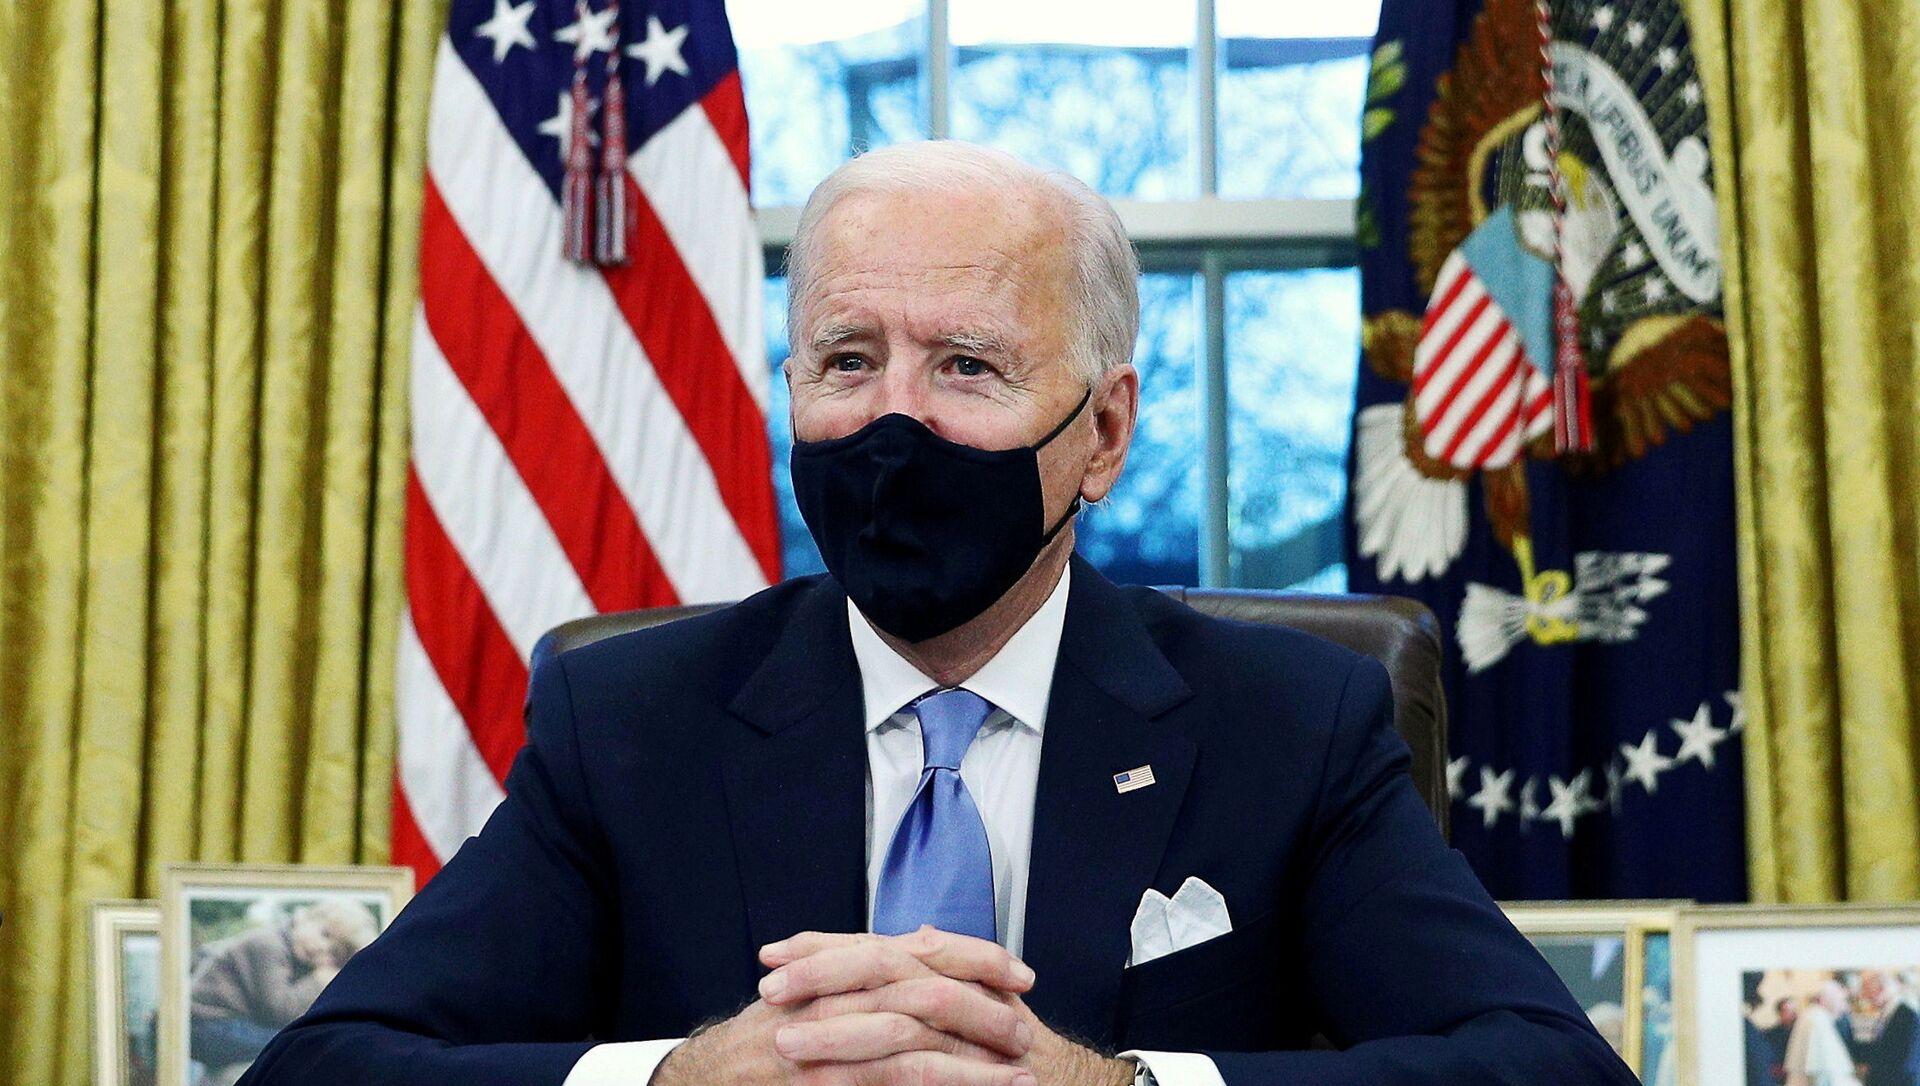 Joe Biden, presidente de EEUU - Sputnik Mundo, 1920, 01.02.2021